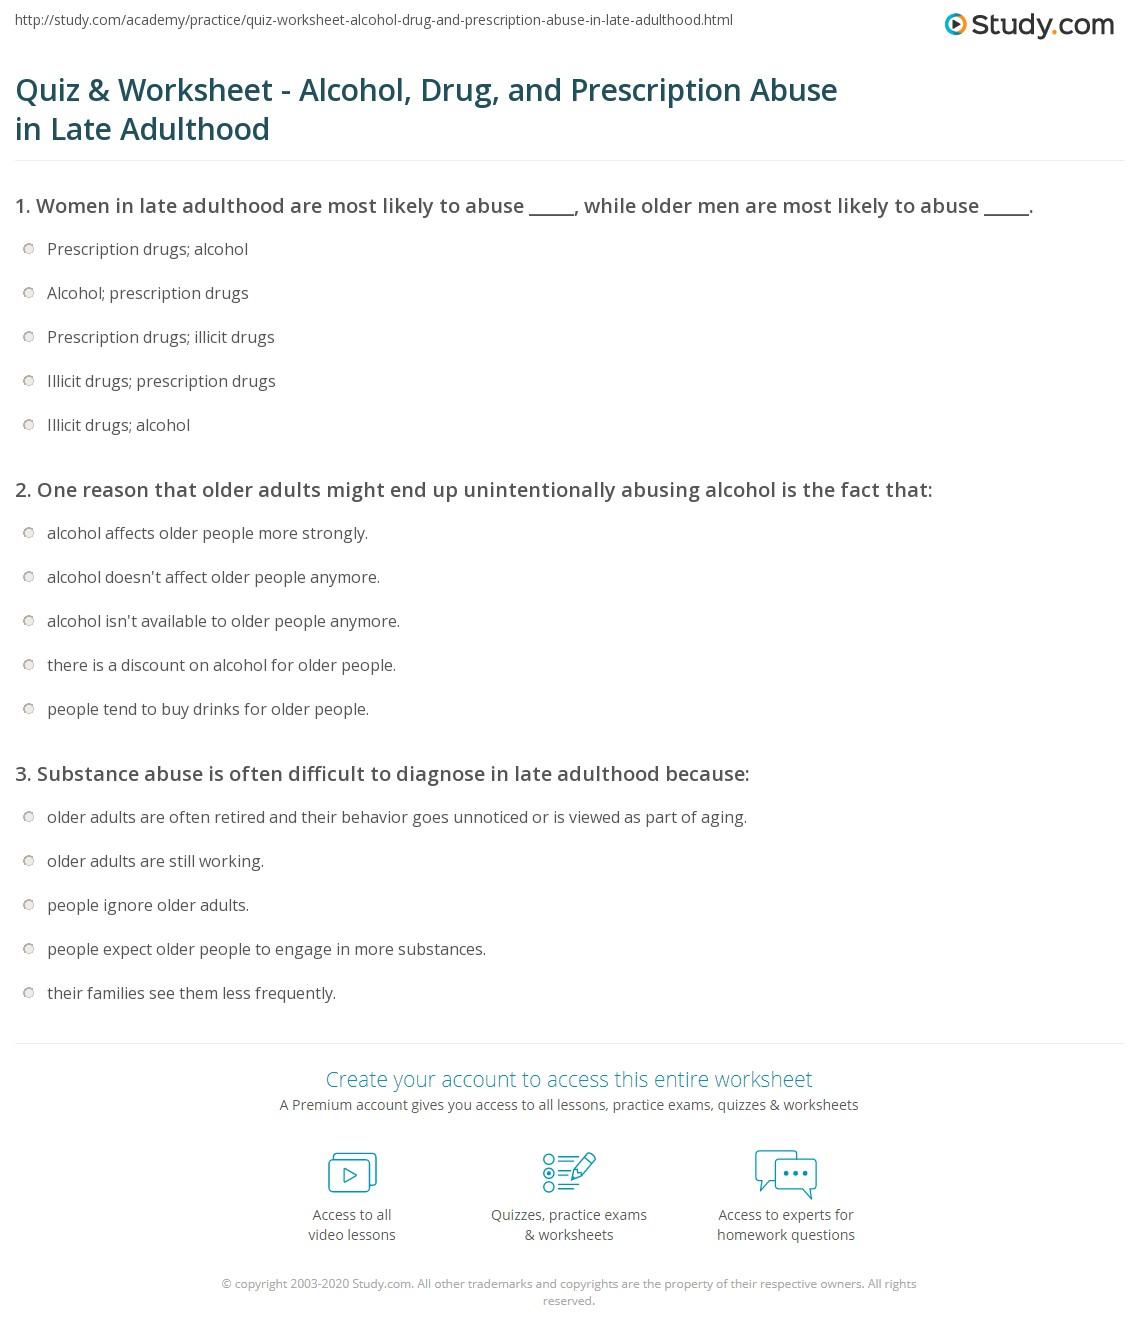 Quiz & Worksheet - Alcohol, Drug, and Prescription Abuse in ...